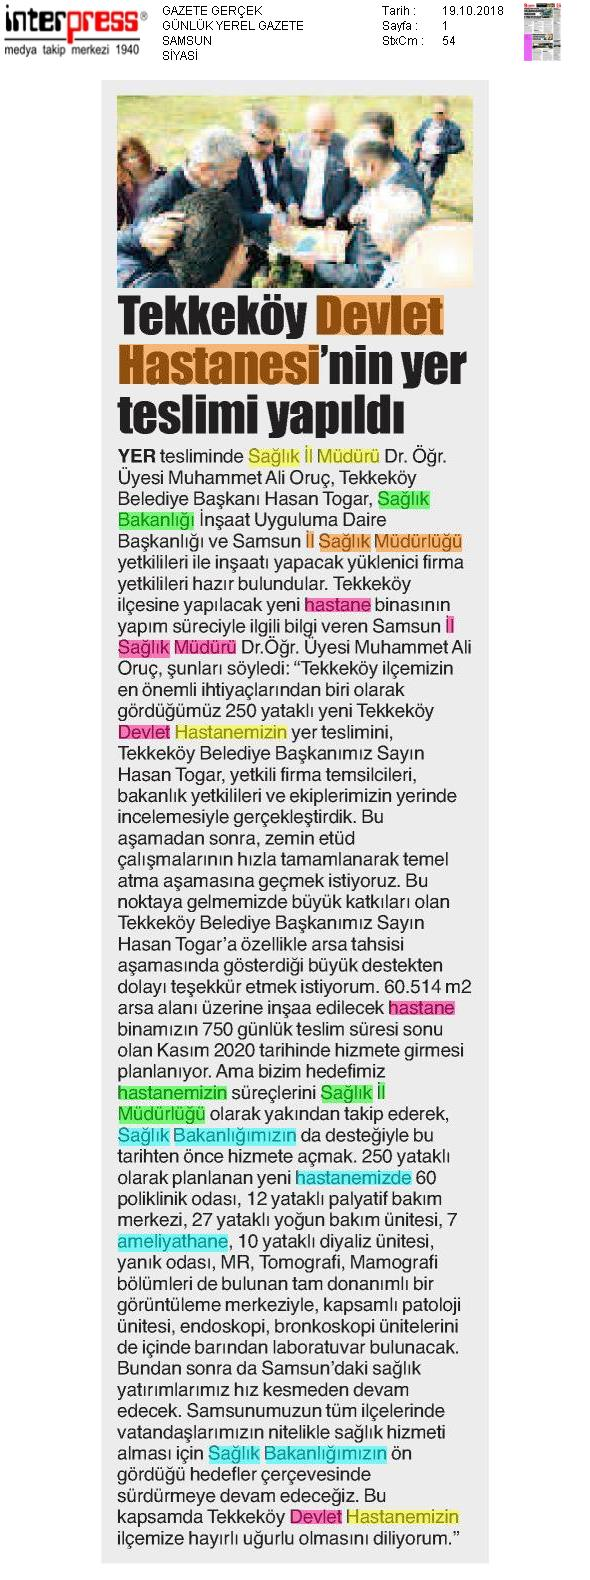 GAZETE+GERÇEK_20181019_9 (2).jpg